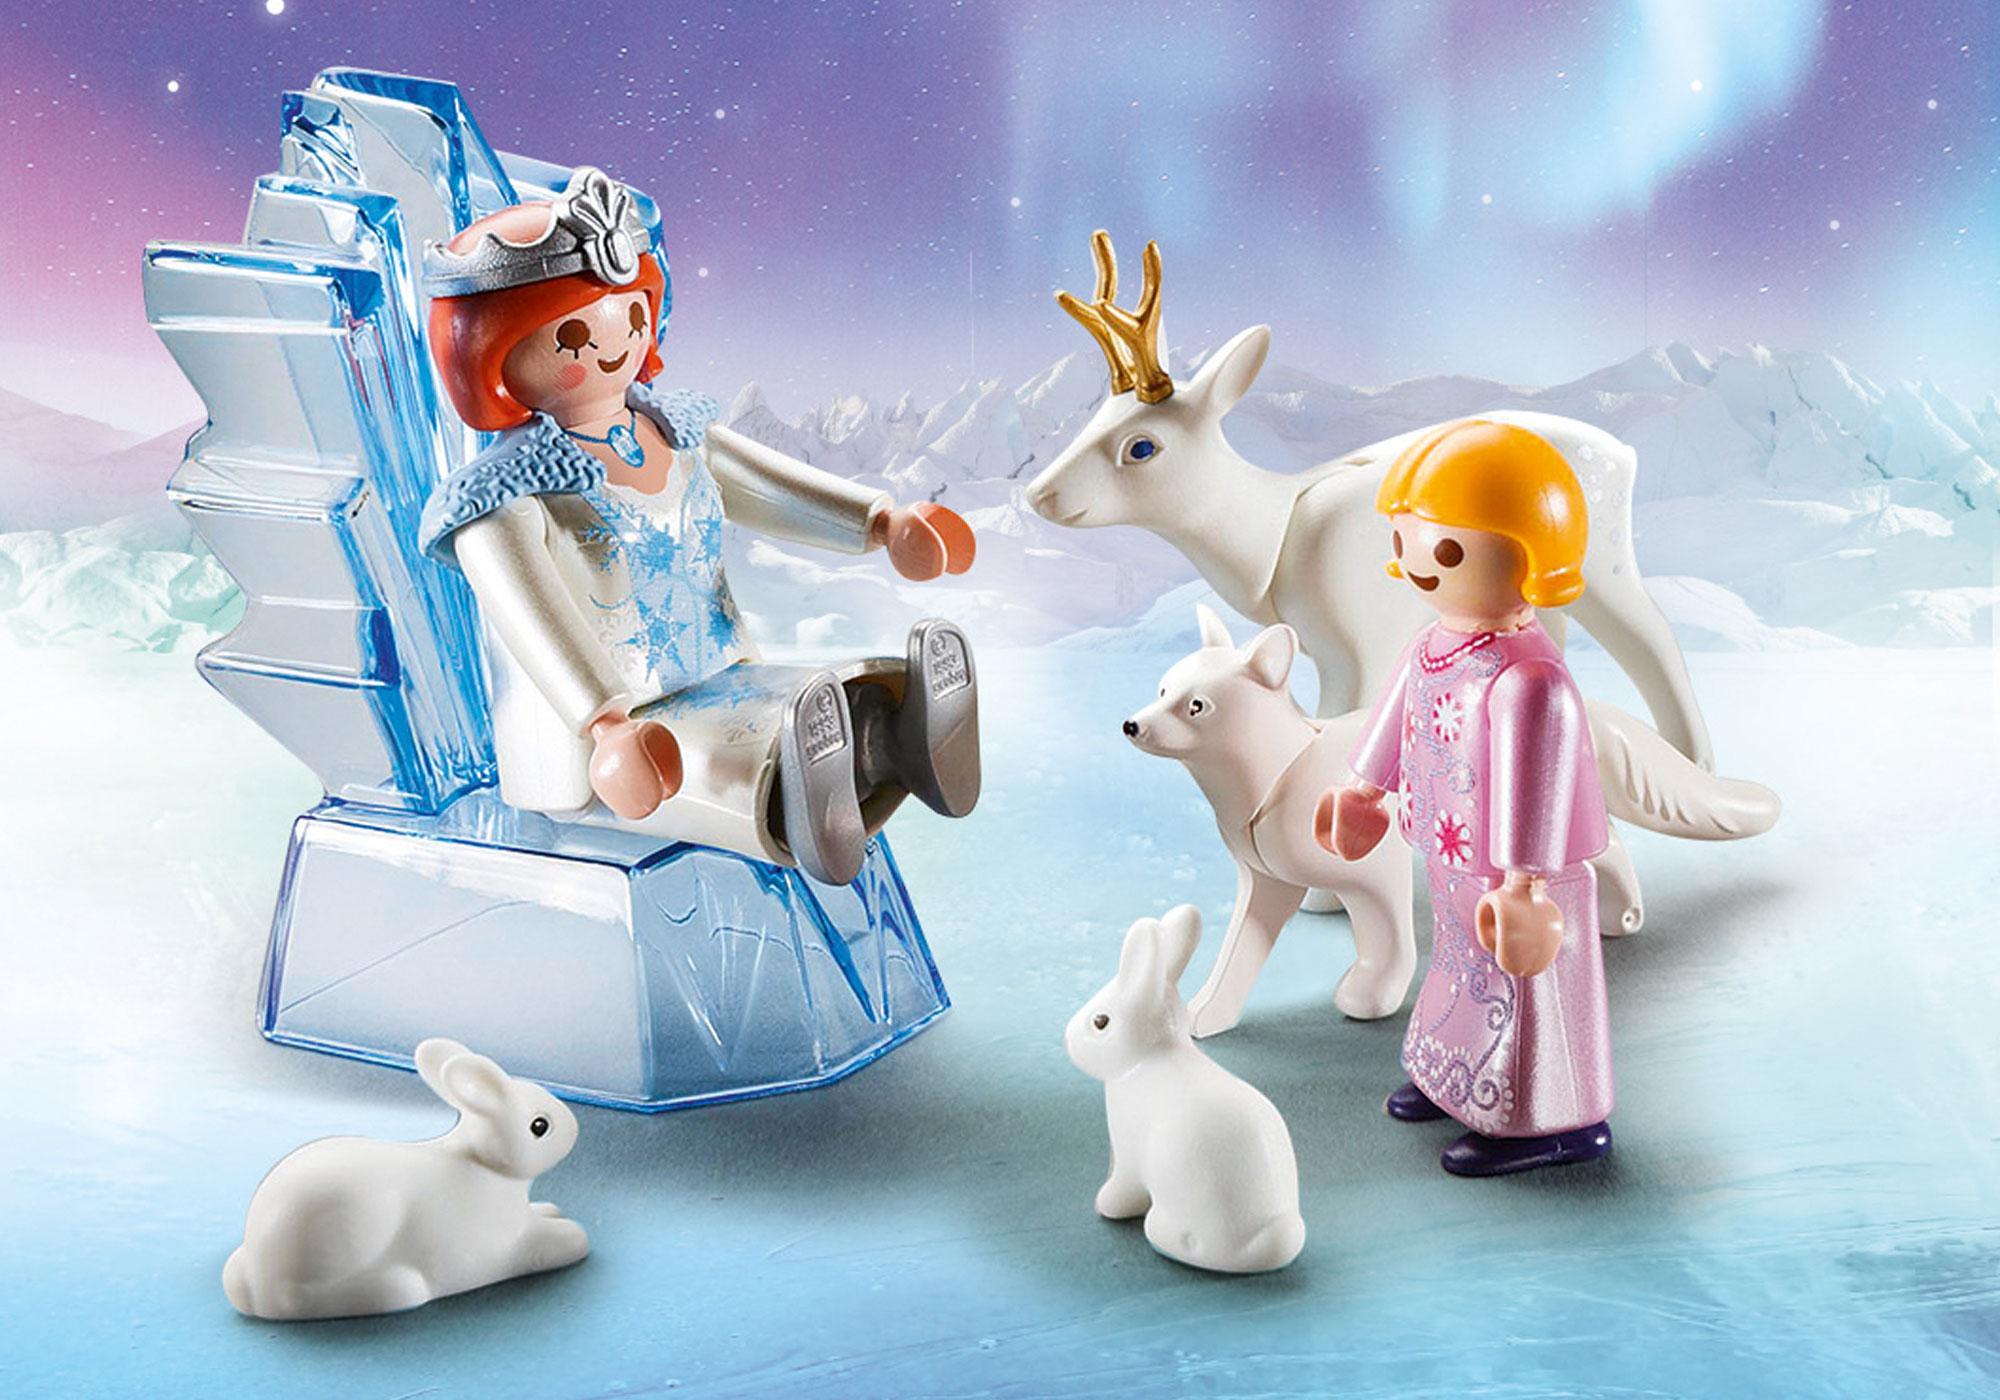 http://media.playmobil.com/i/playmobil/9310_product_extra1/Winter Princess Play Box